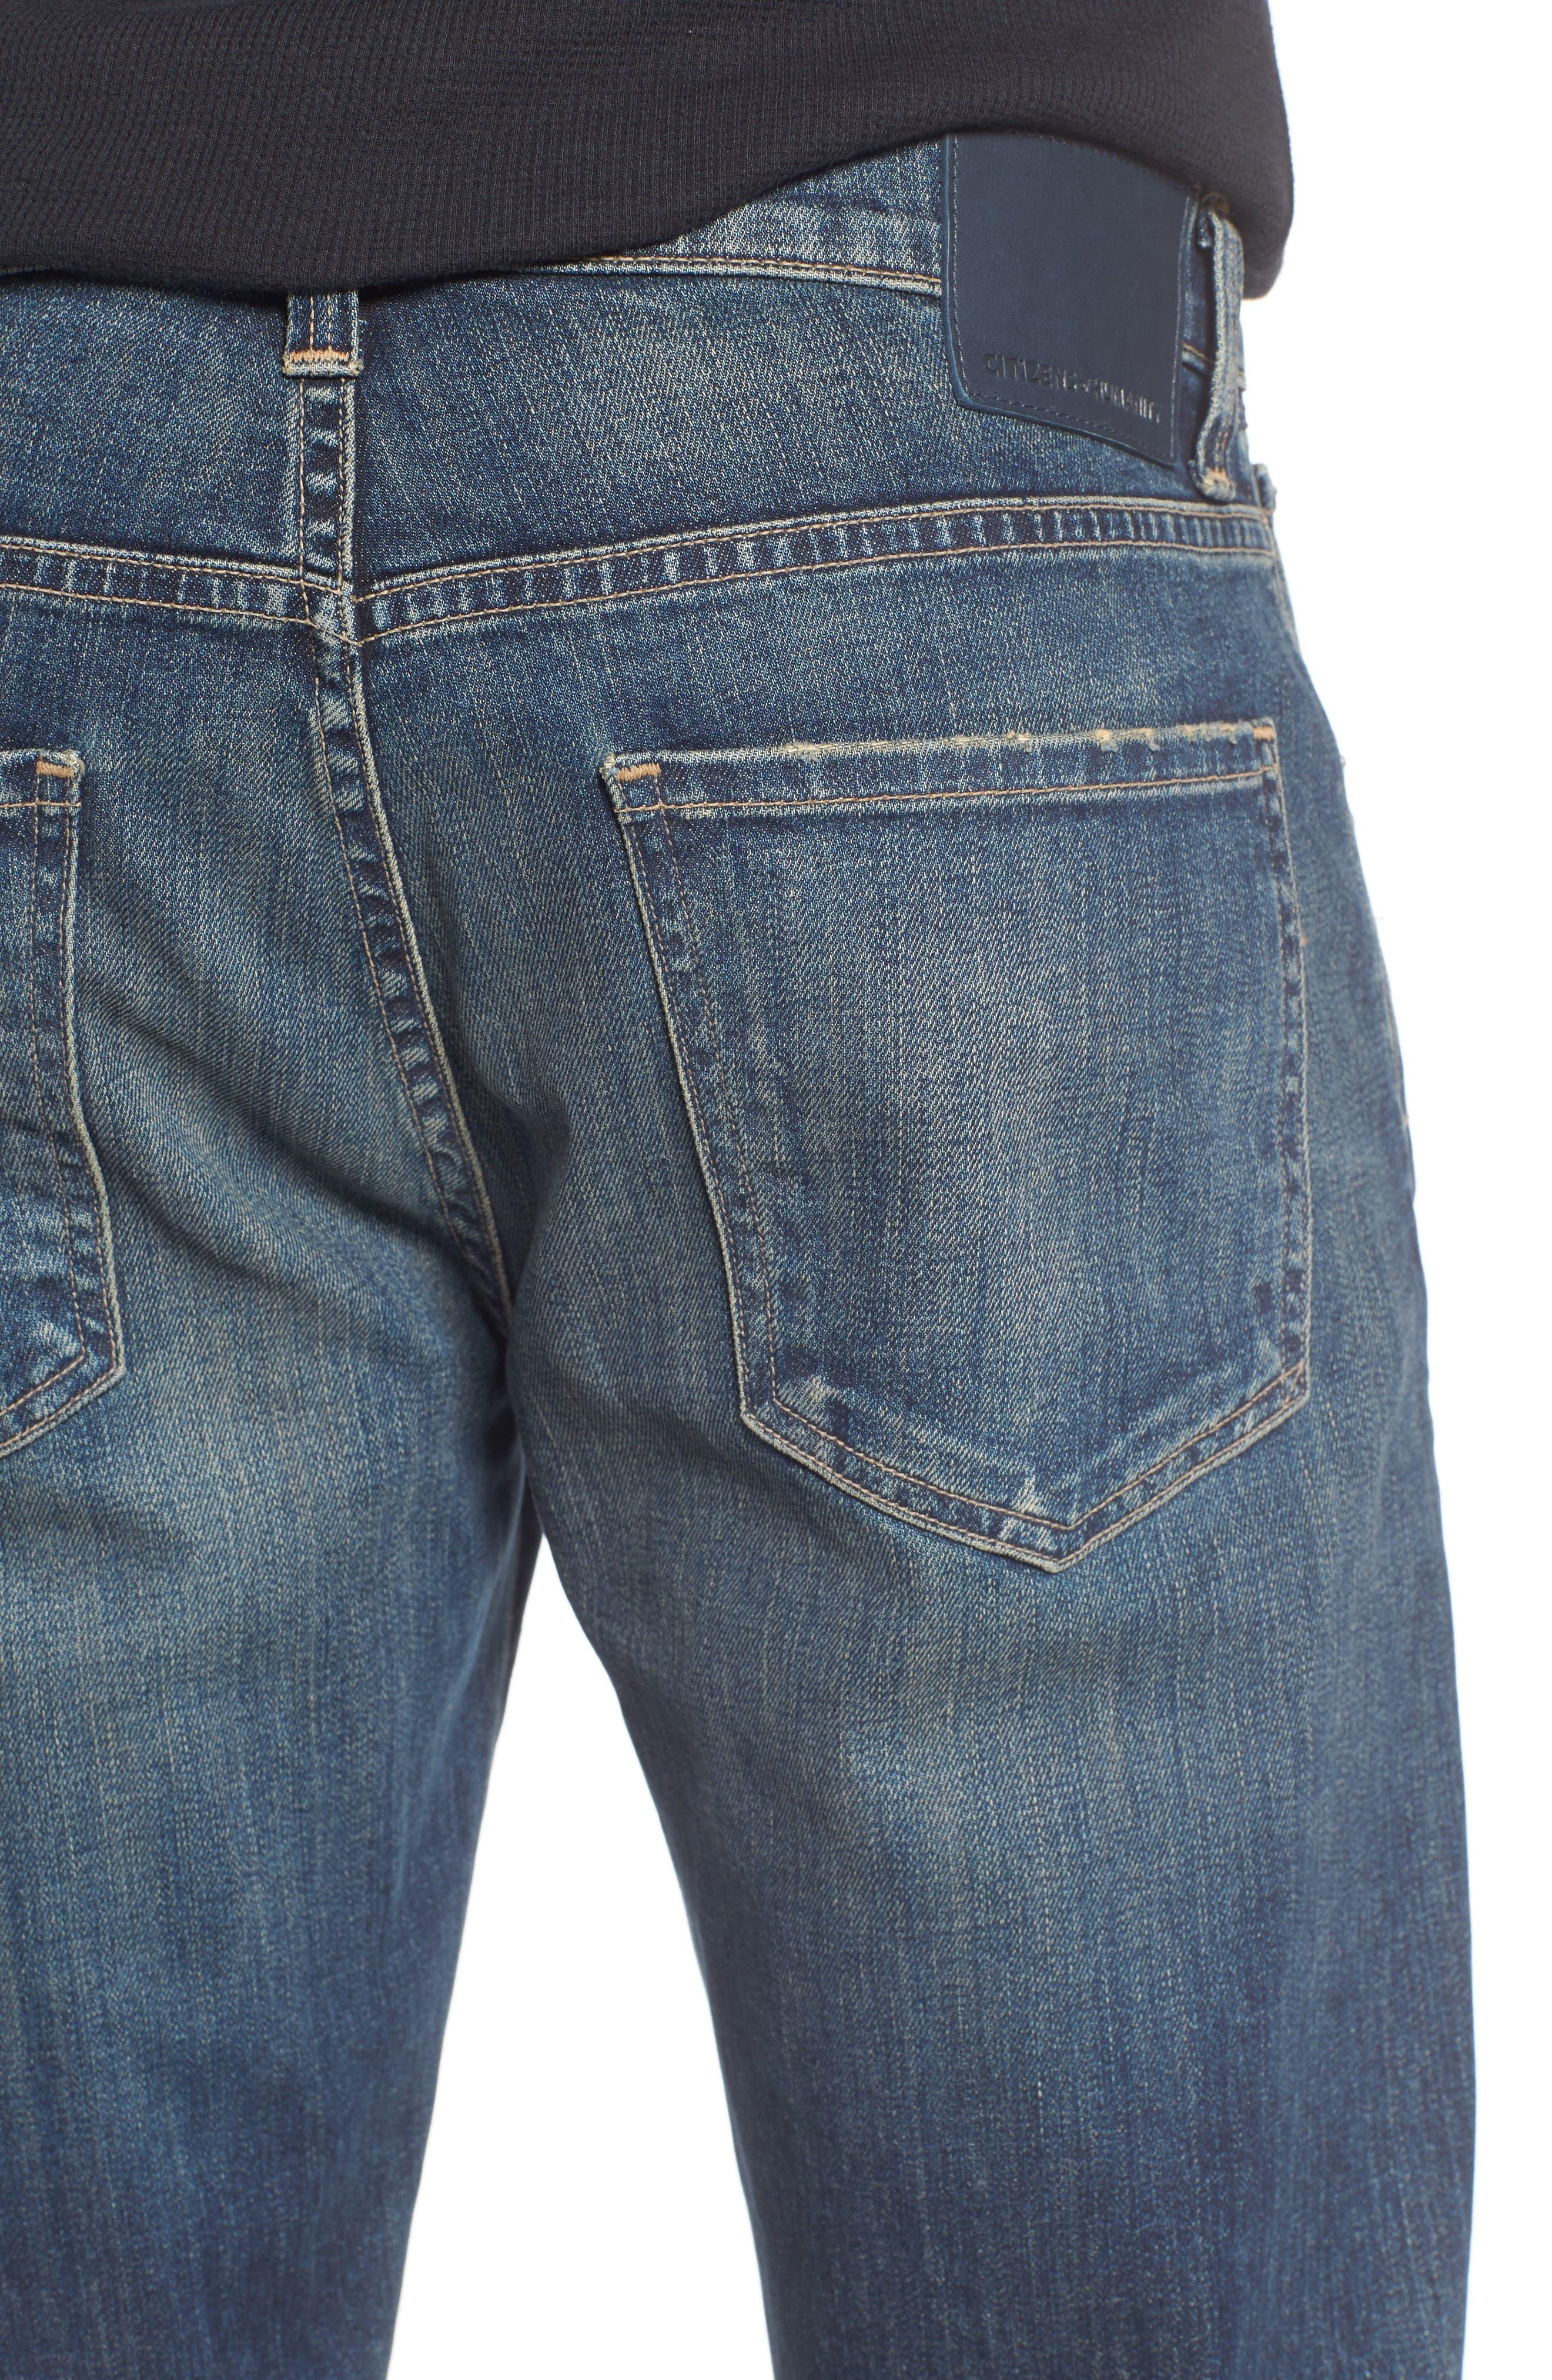 Gage Slim Straight Leg Jeans,                             Alternate thumbnail 4, color,                             DUNES